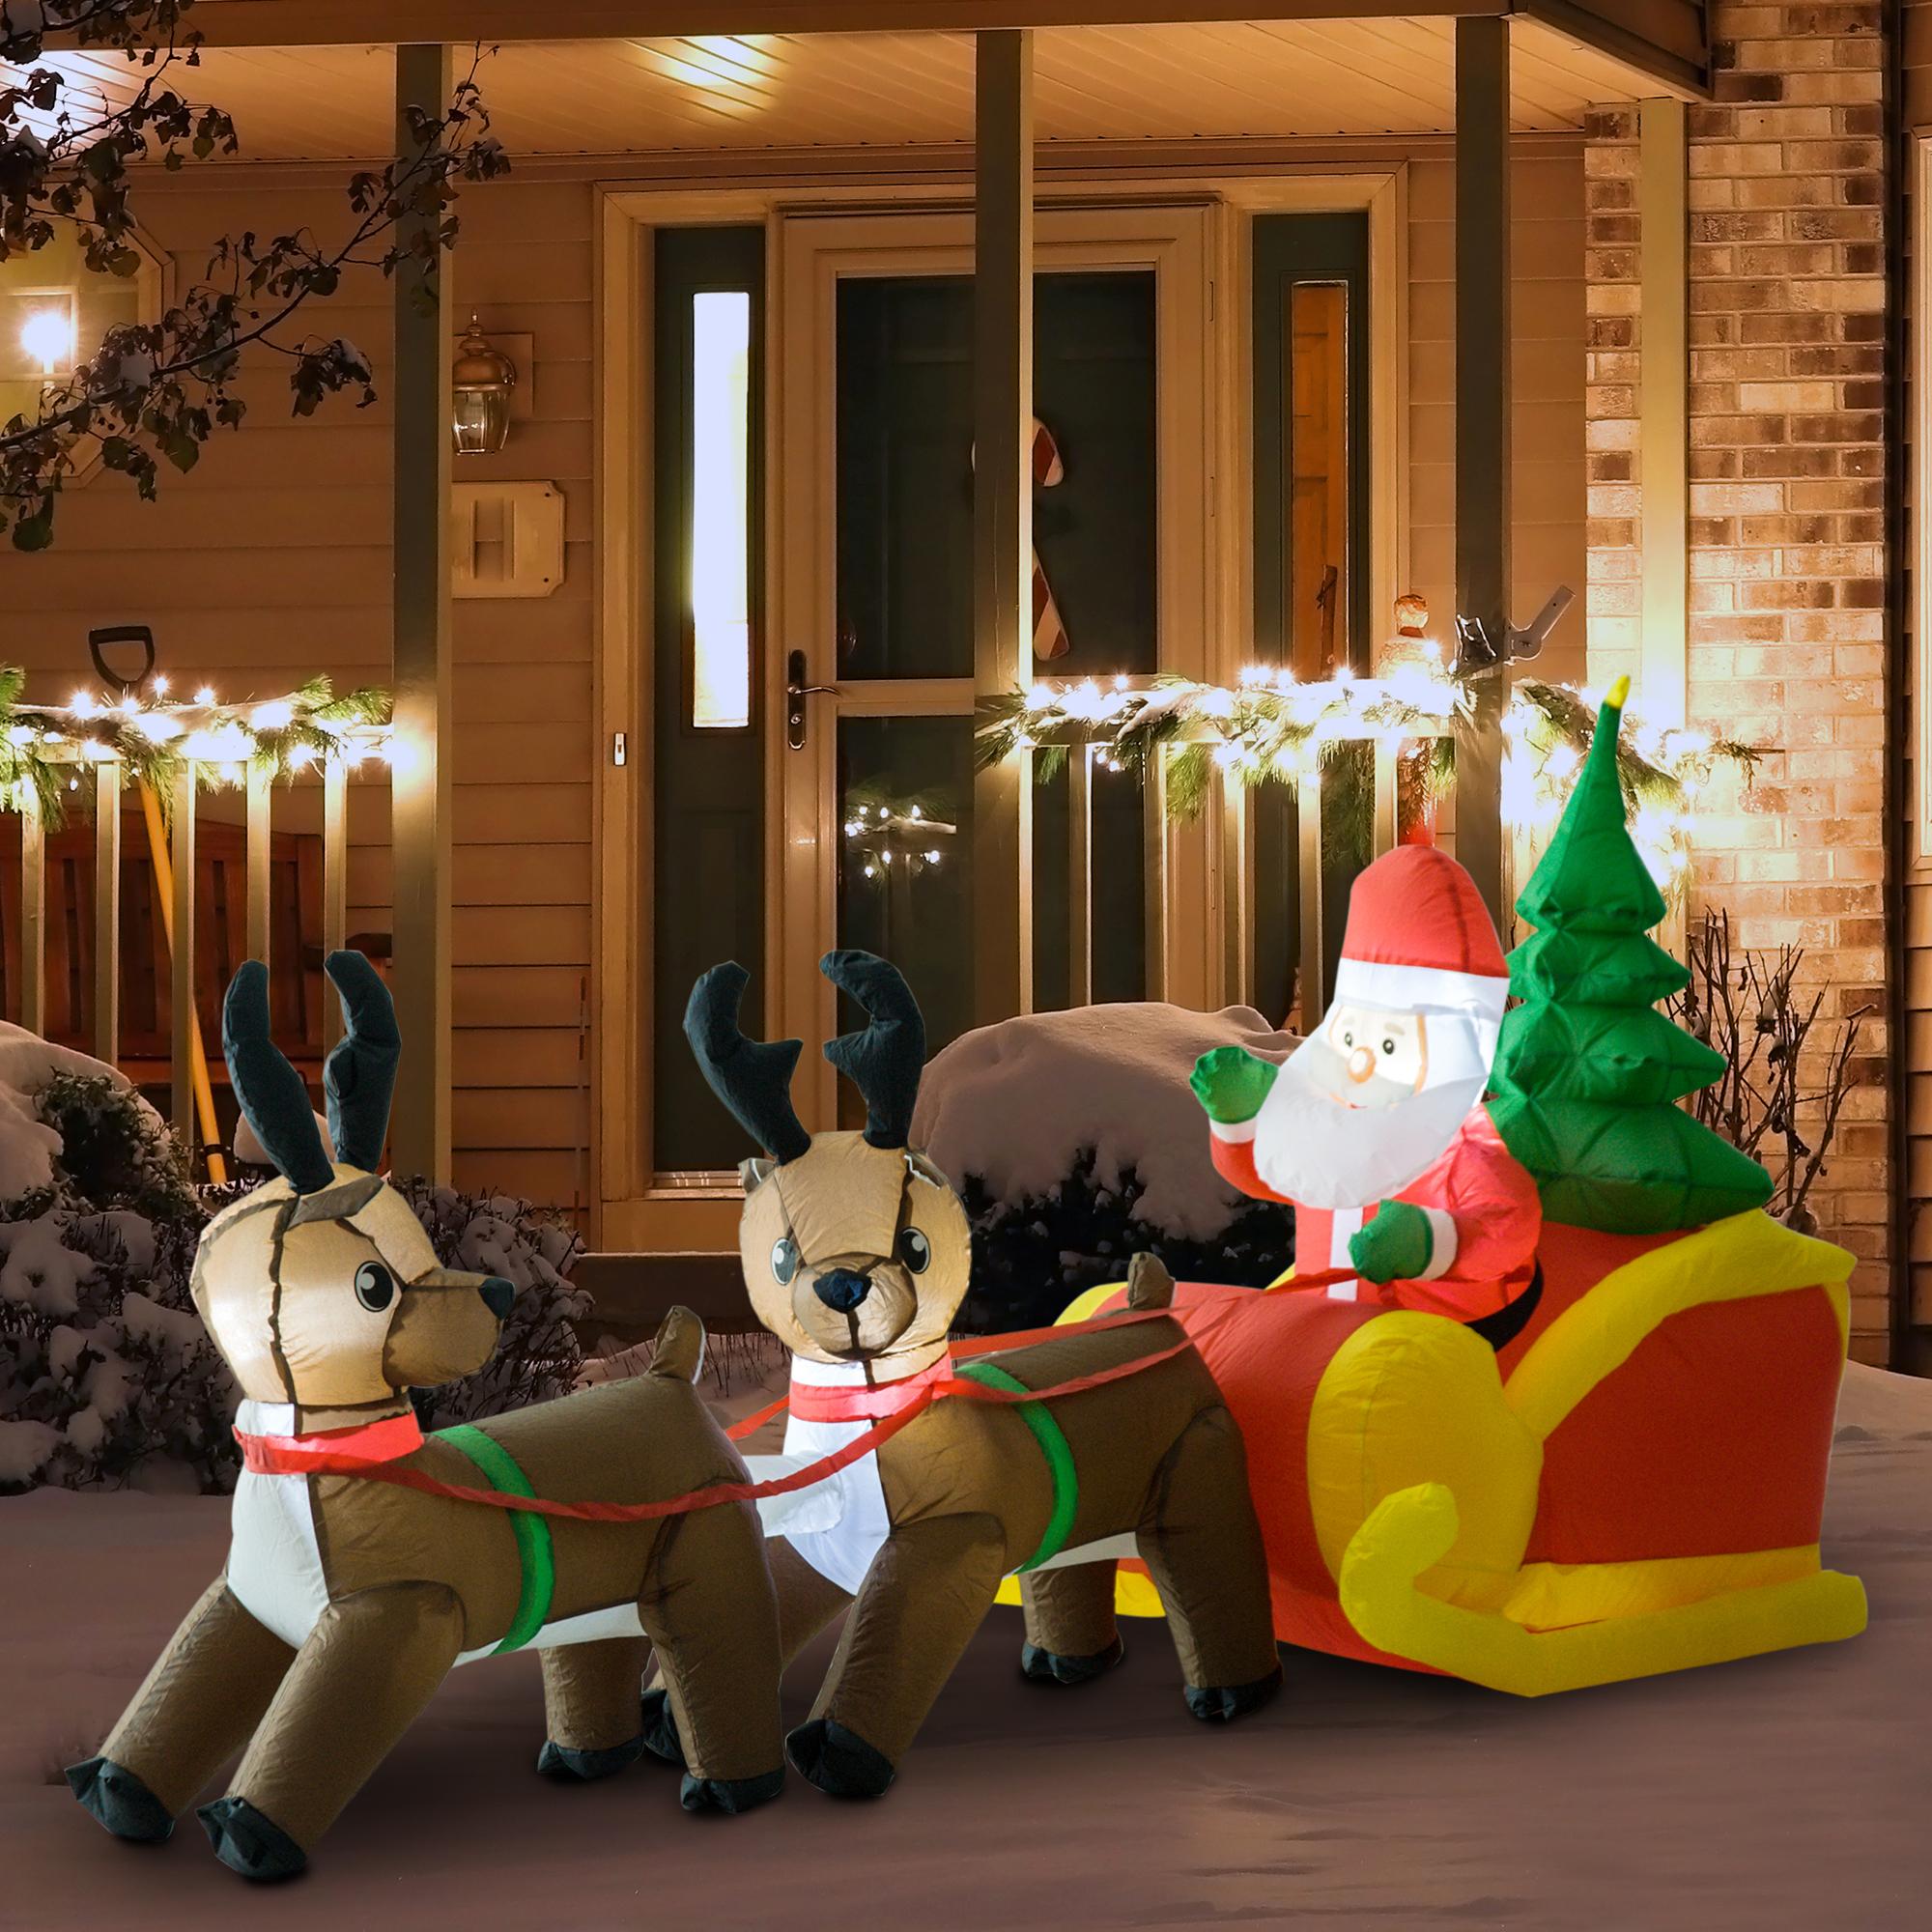 HomCom 7' Outdoor Lighted Inflatable Christmas Santas Decoration - $39.99 + Free Shipping